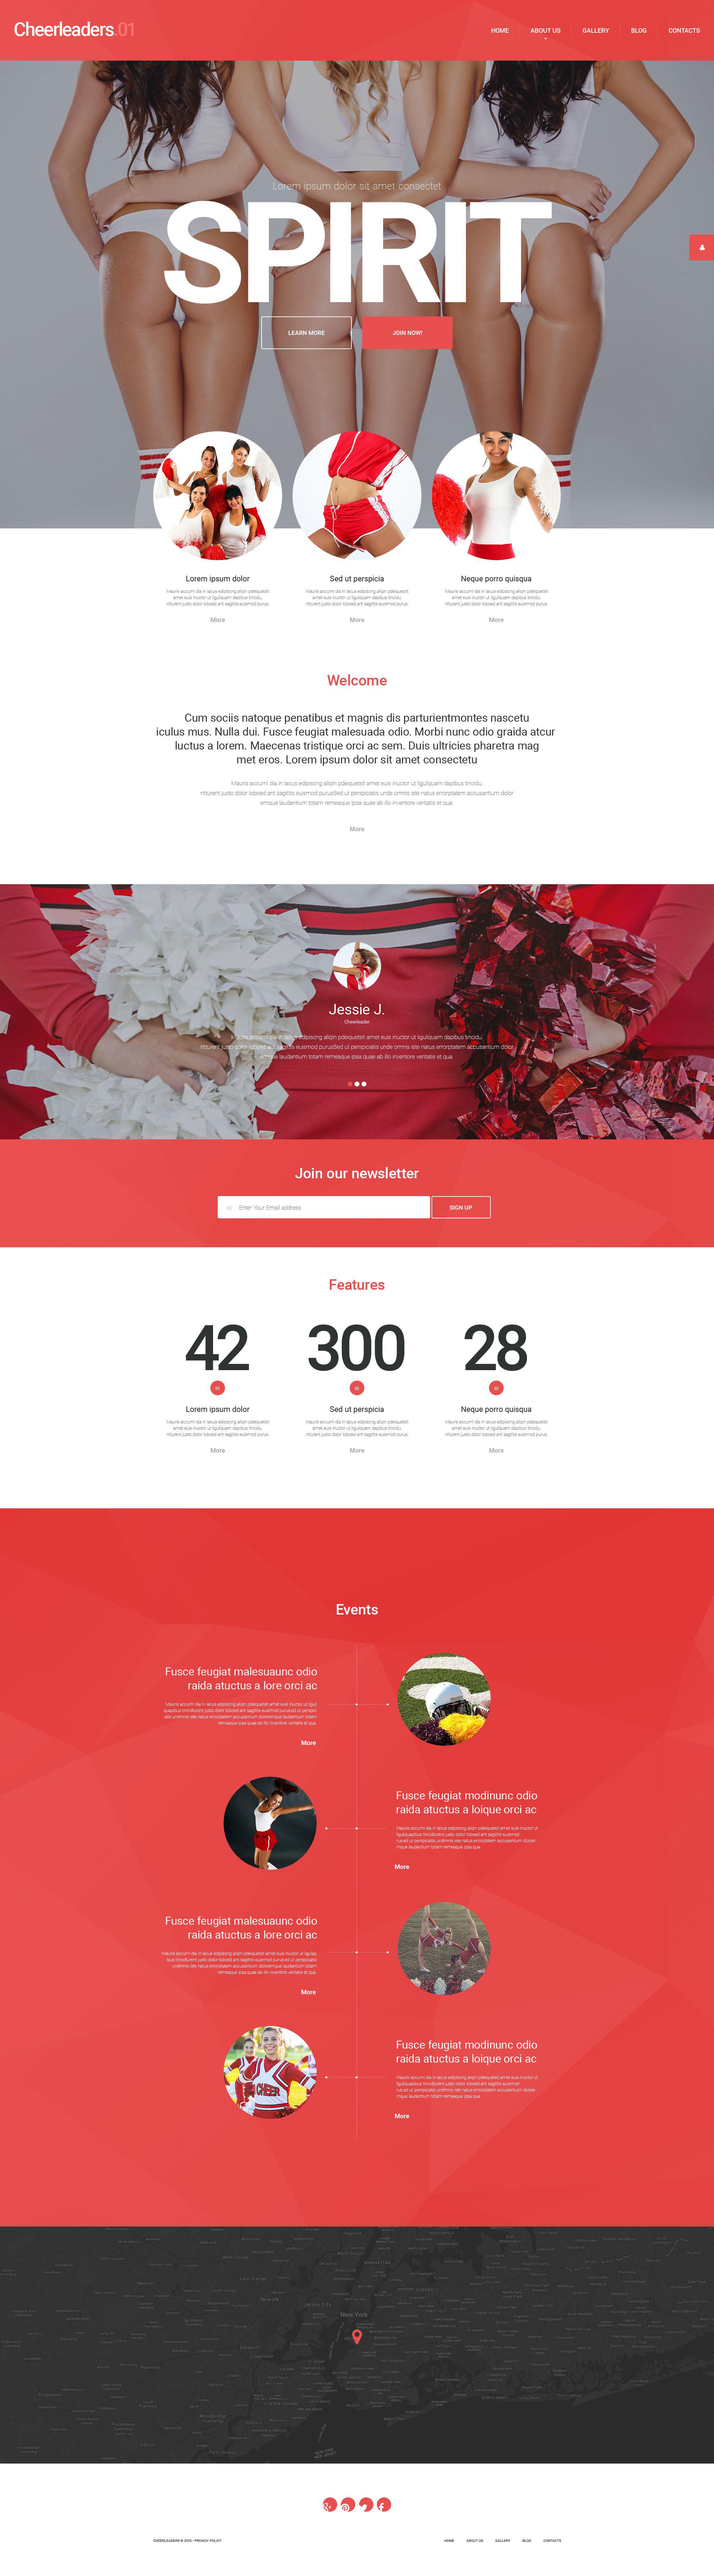 """Energetic Cheerleaders"" Responsive WordPress thema №54993 - screenshot"